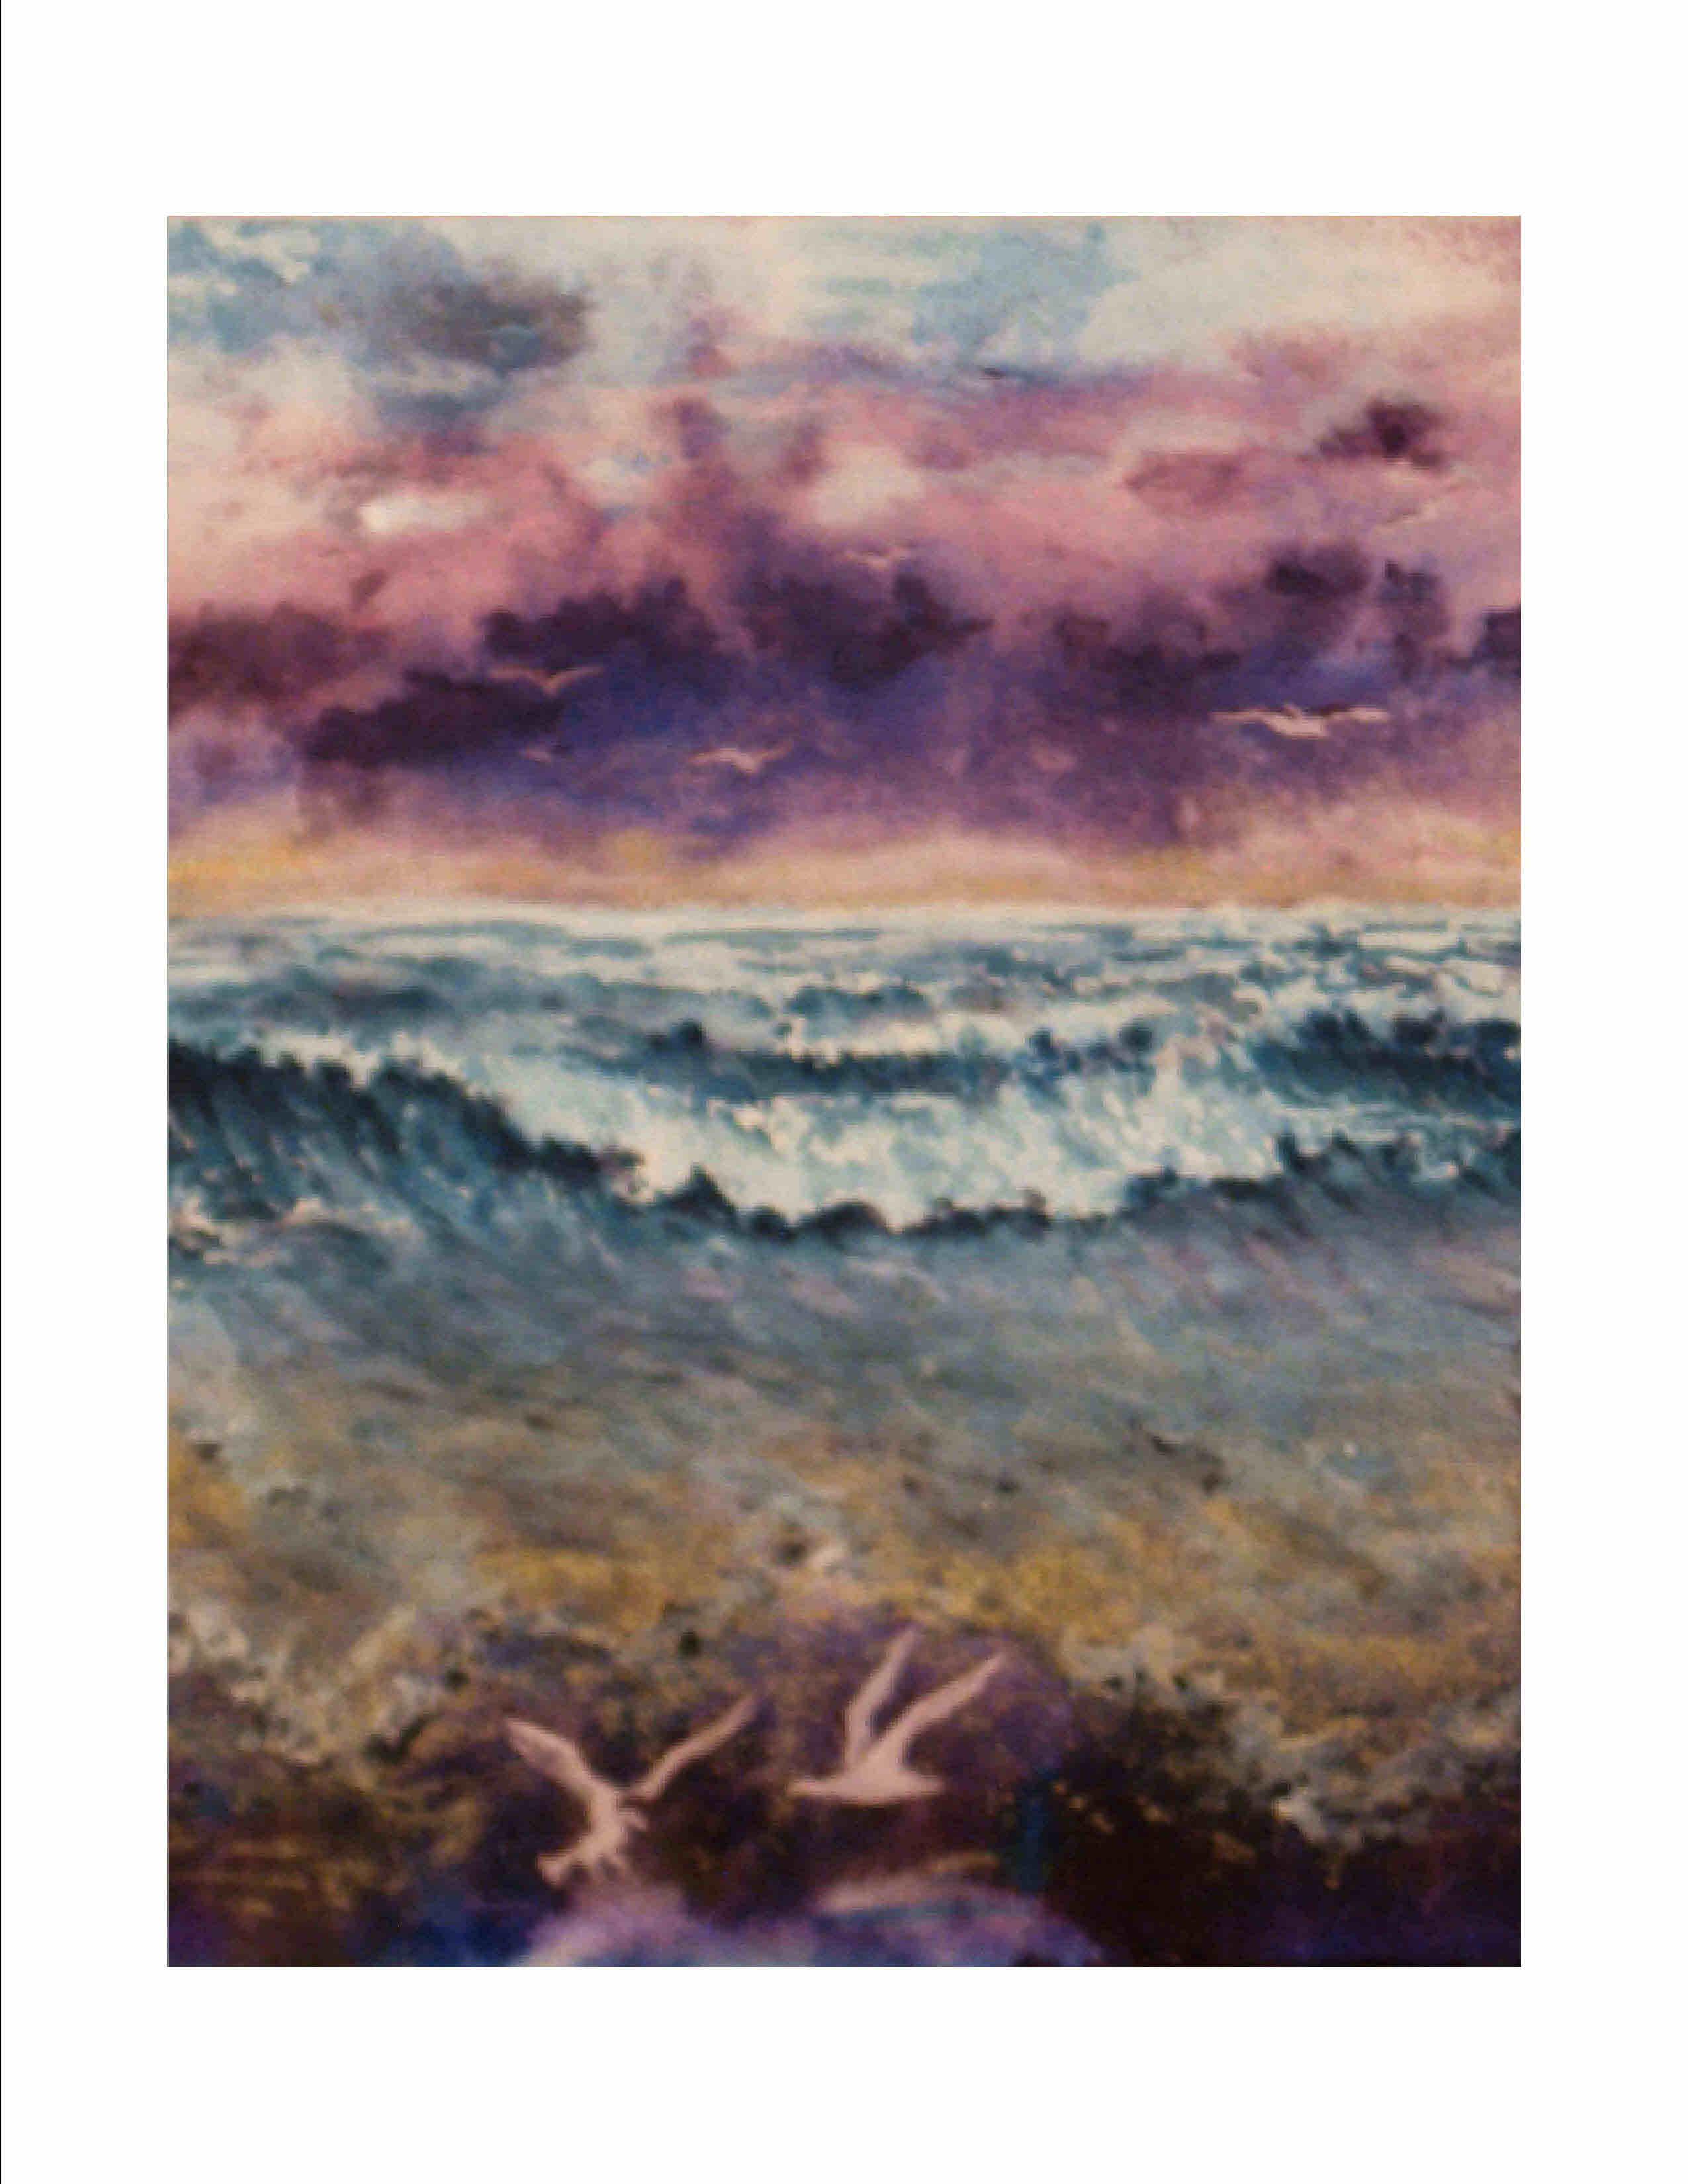 Purple Skies of Hurricane MIchael - Purple Skies with Gold Sunrise